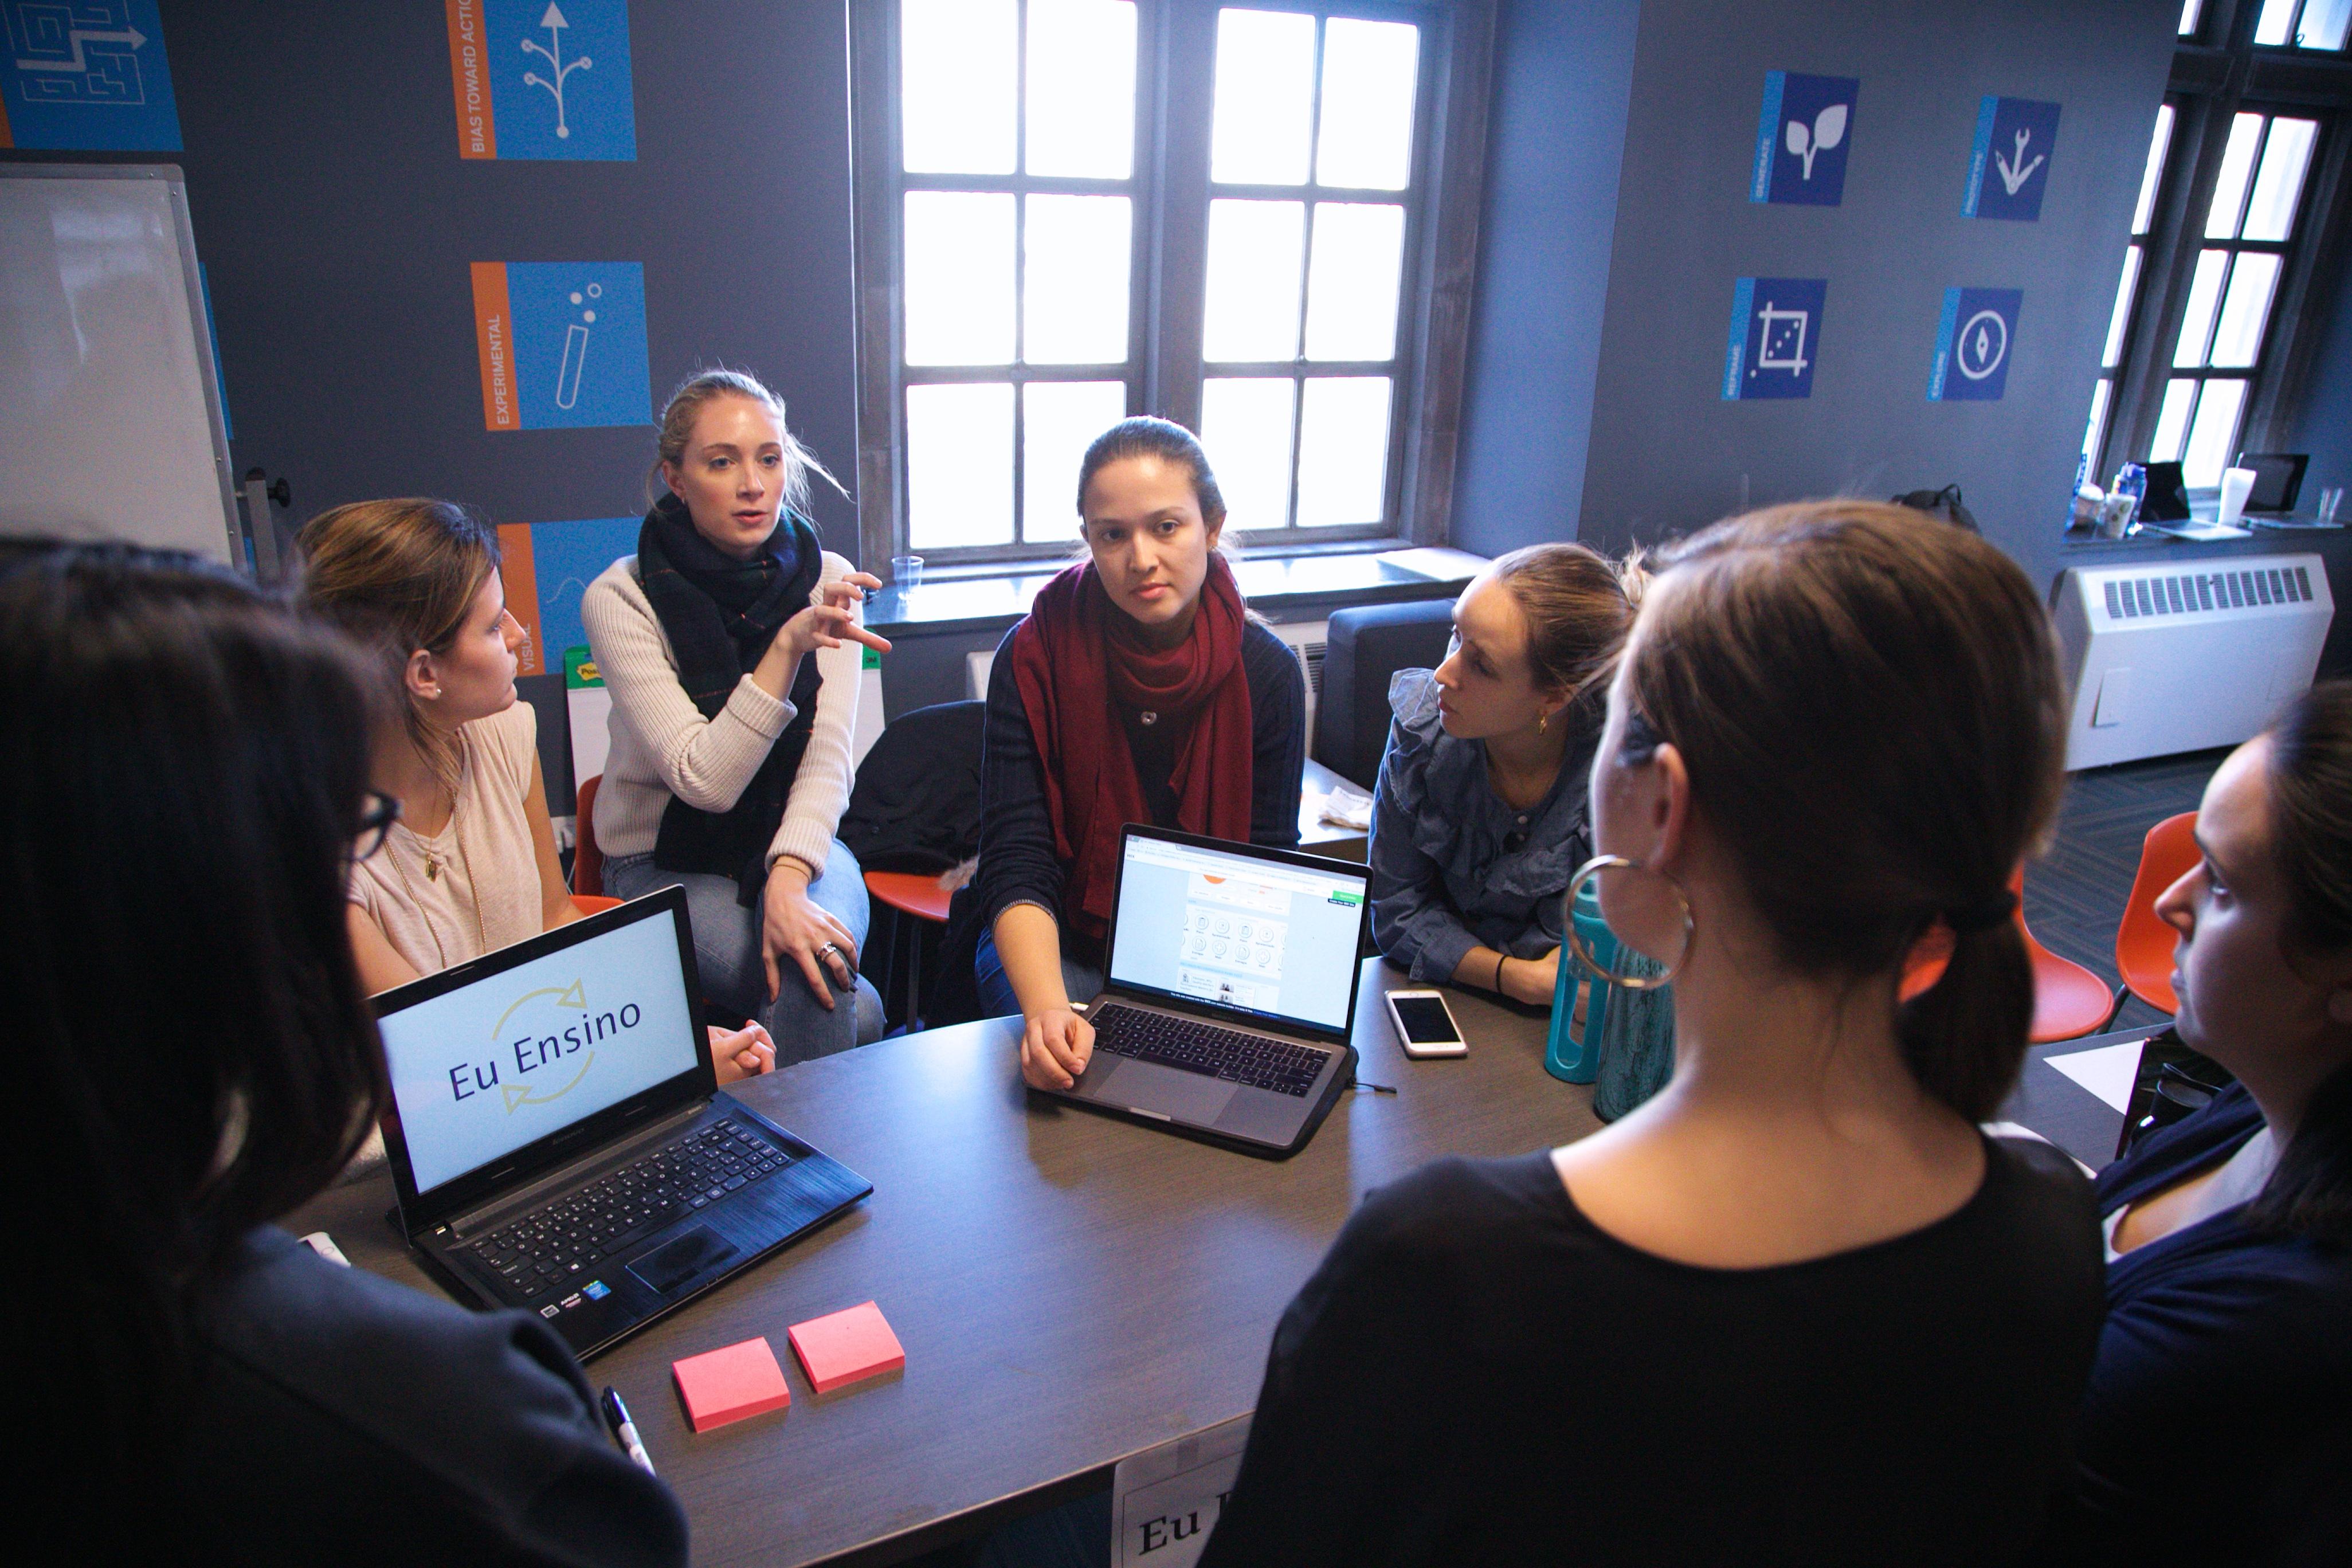 EdTech Design Challenge - Team Eu Ensino Feb 27